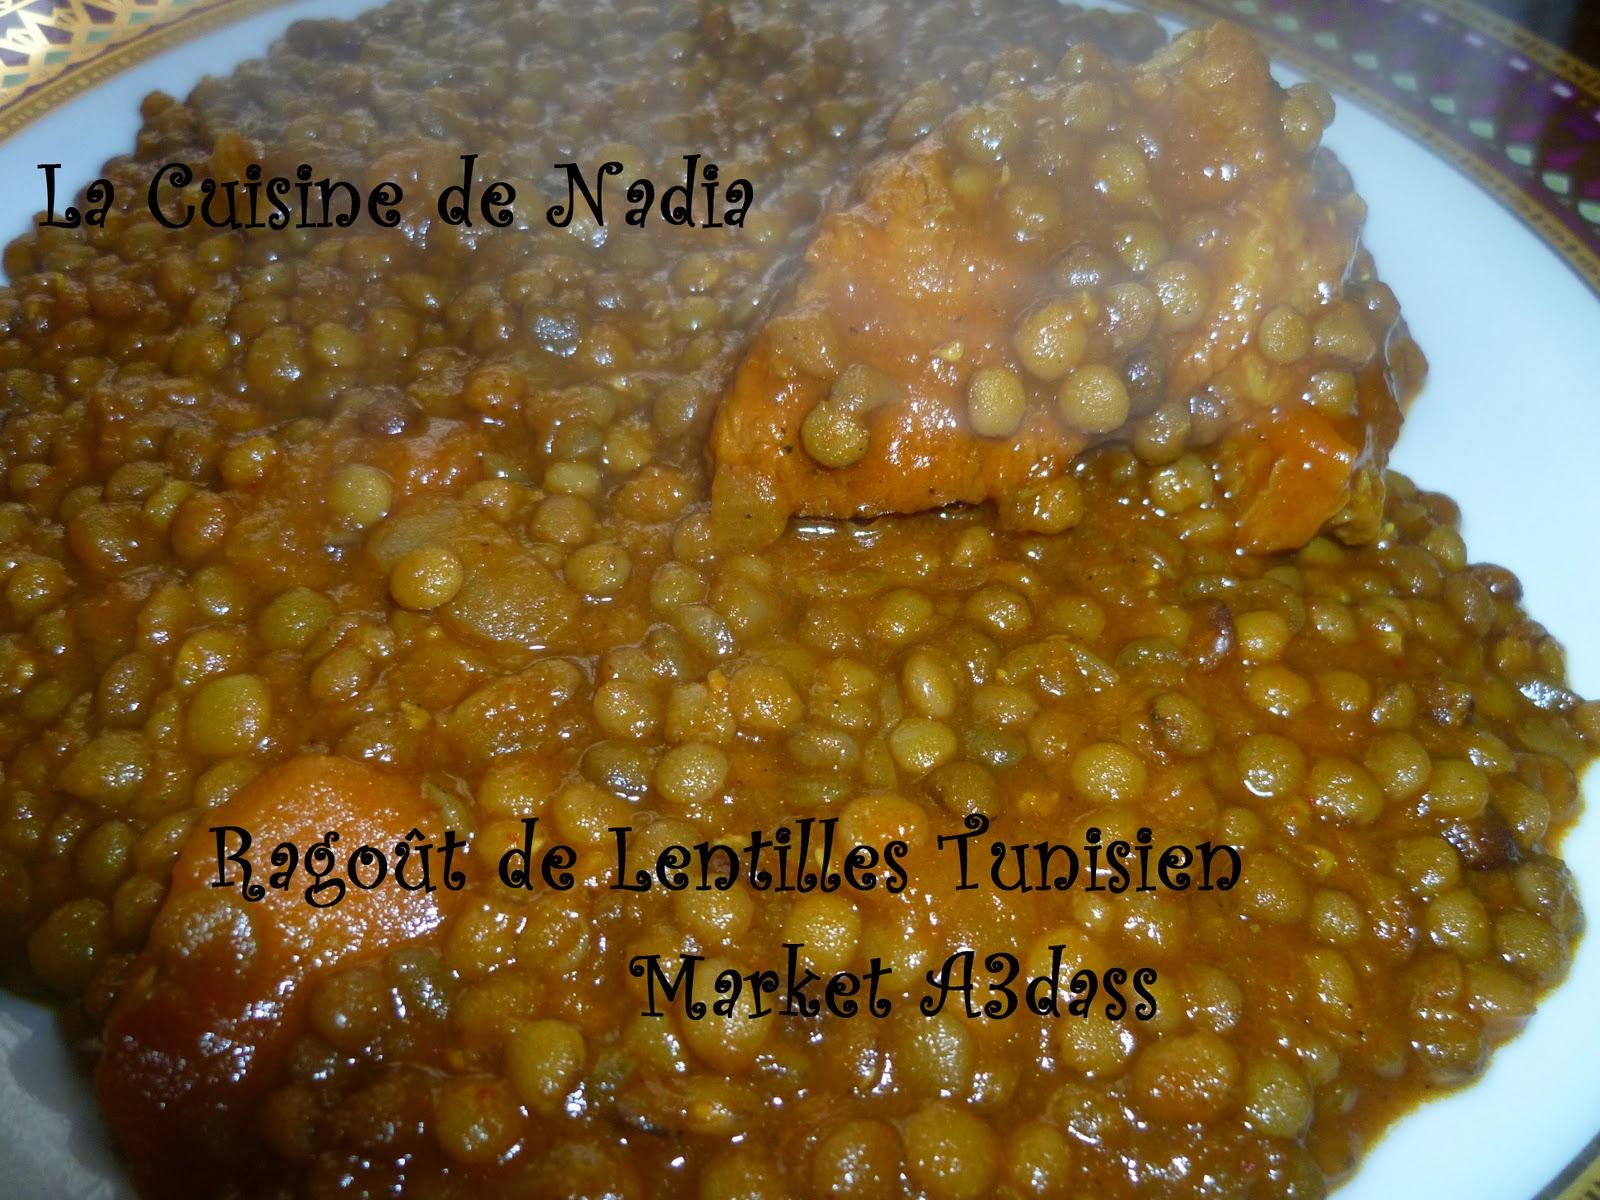 la cuisine de nadia: ragoût de lentilles tunisien - market a3dass